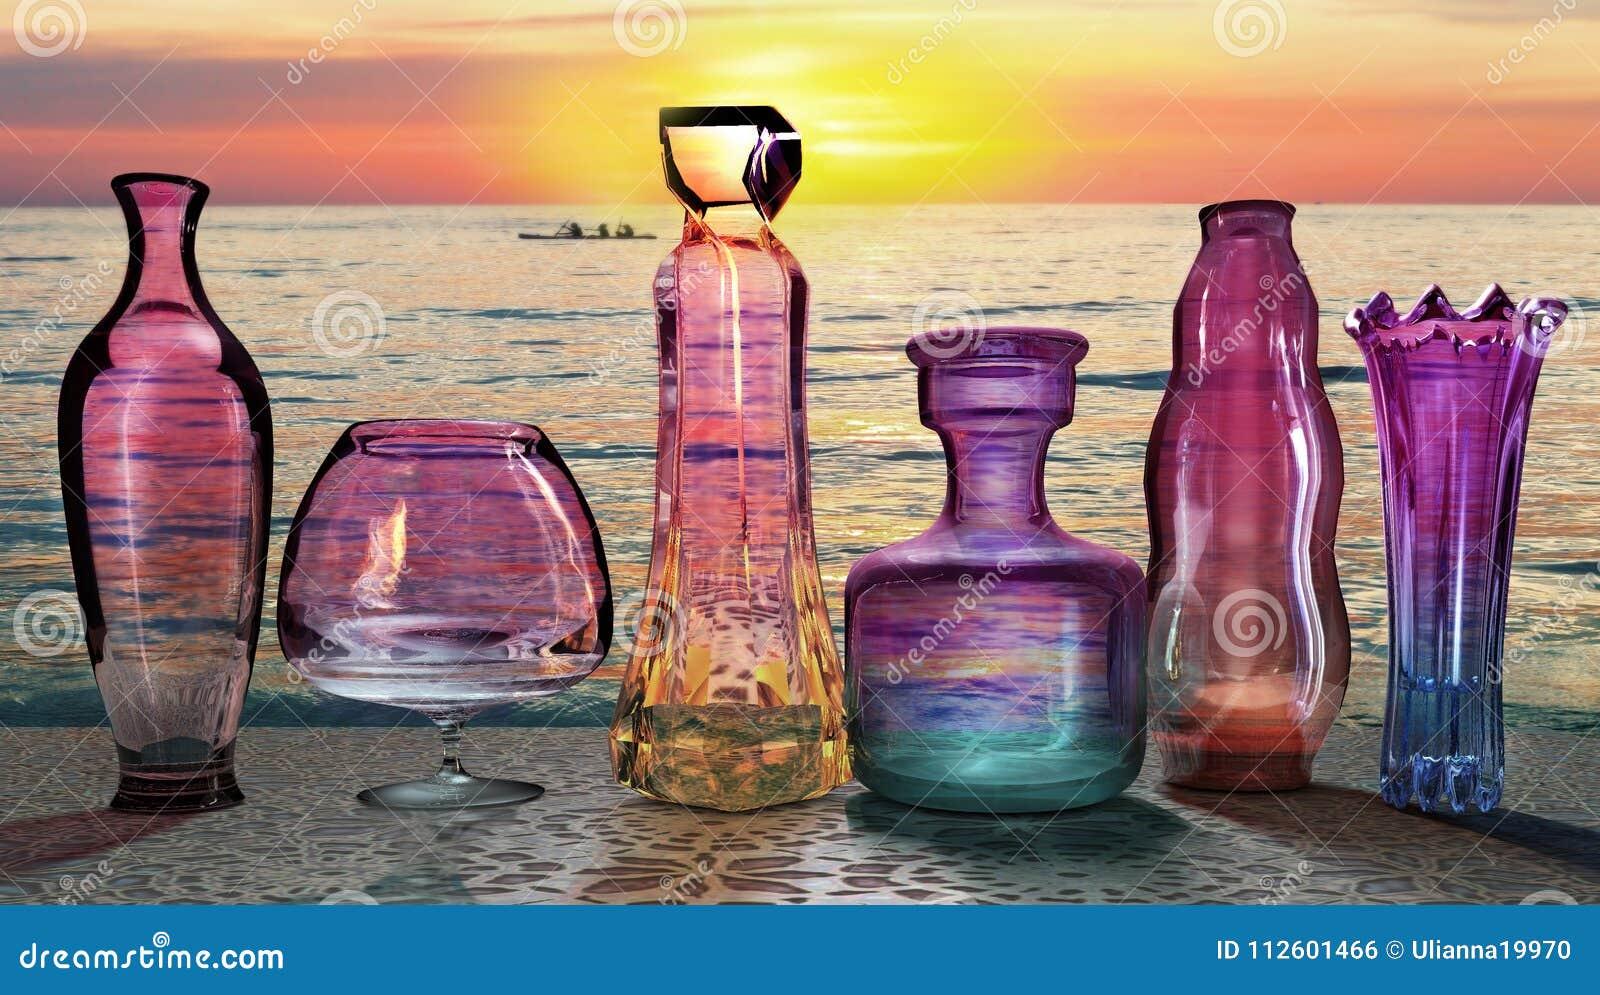 Sunset sun setting send last ultraviolet ray on the set of glass jars